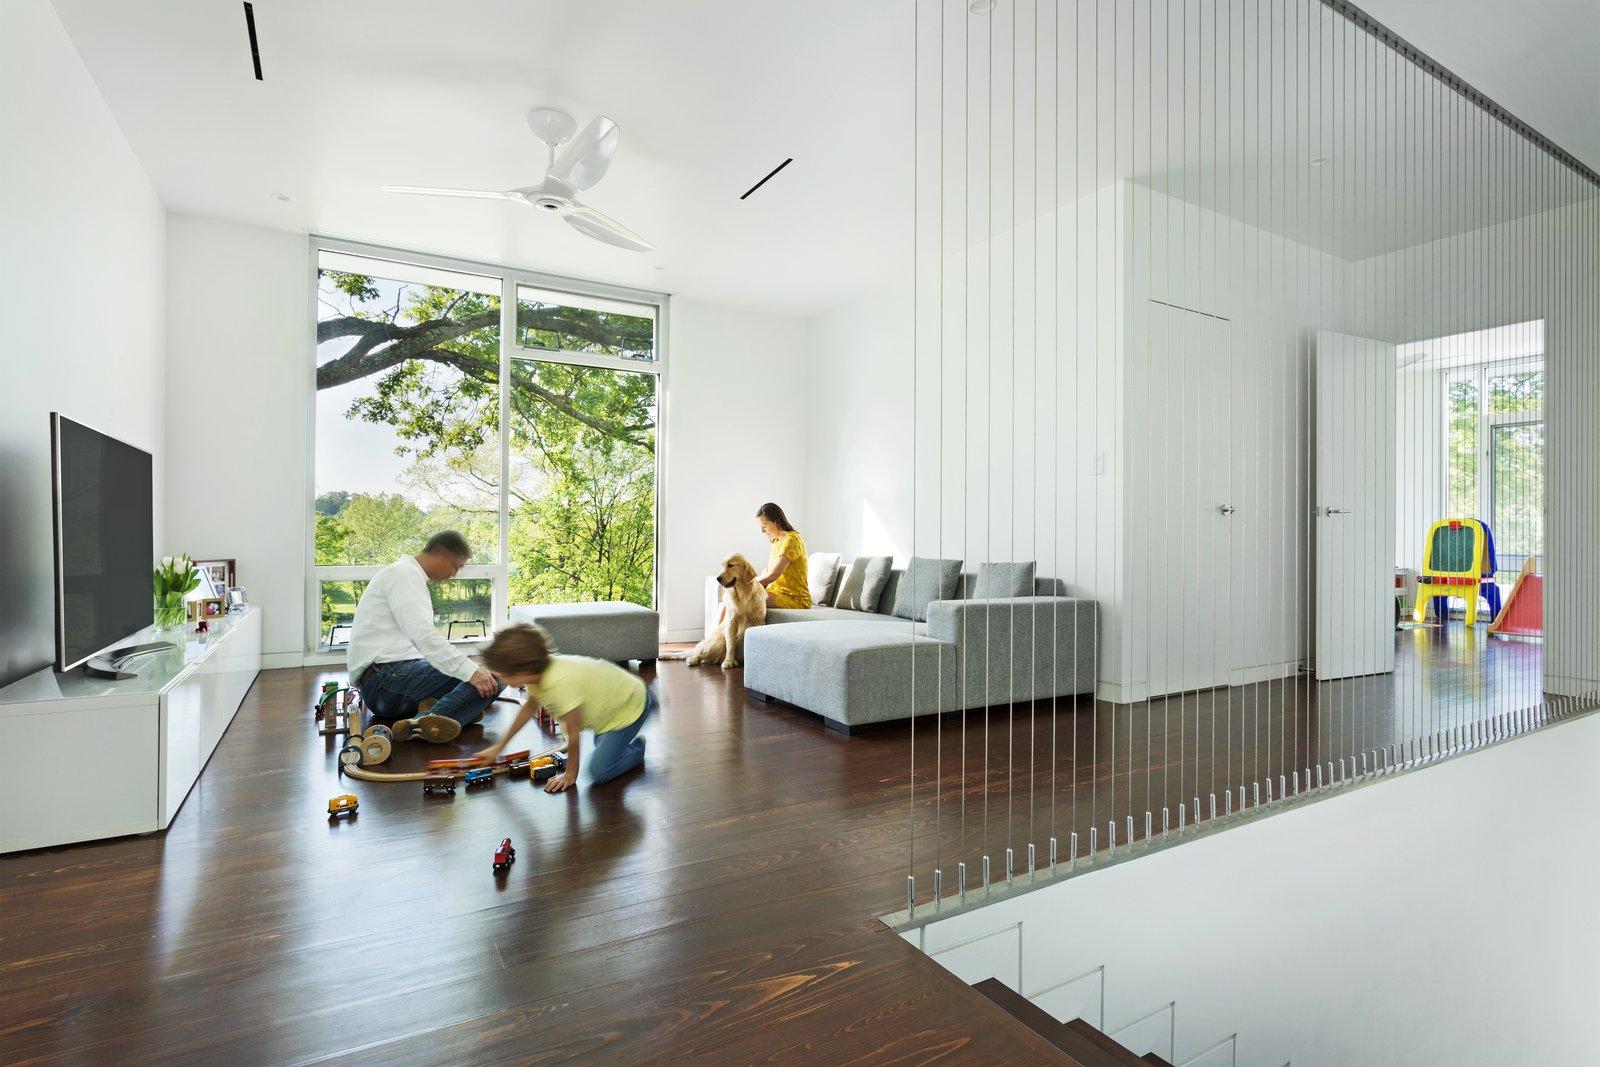 Family Room / Play Room  Boetger Residence by Chad Boetger